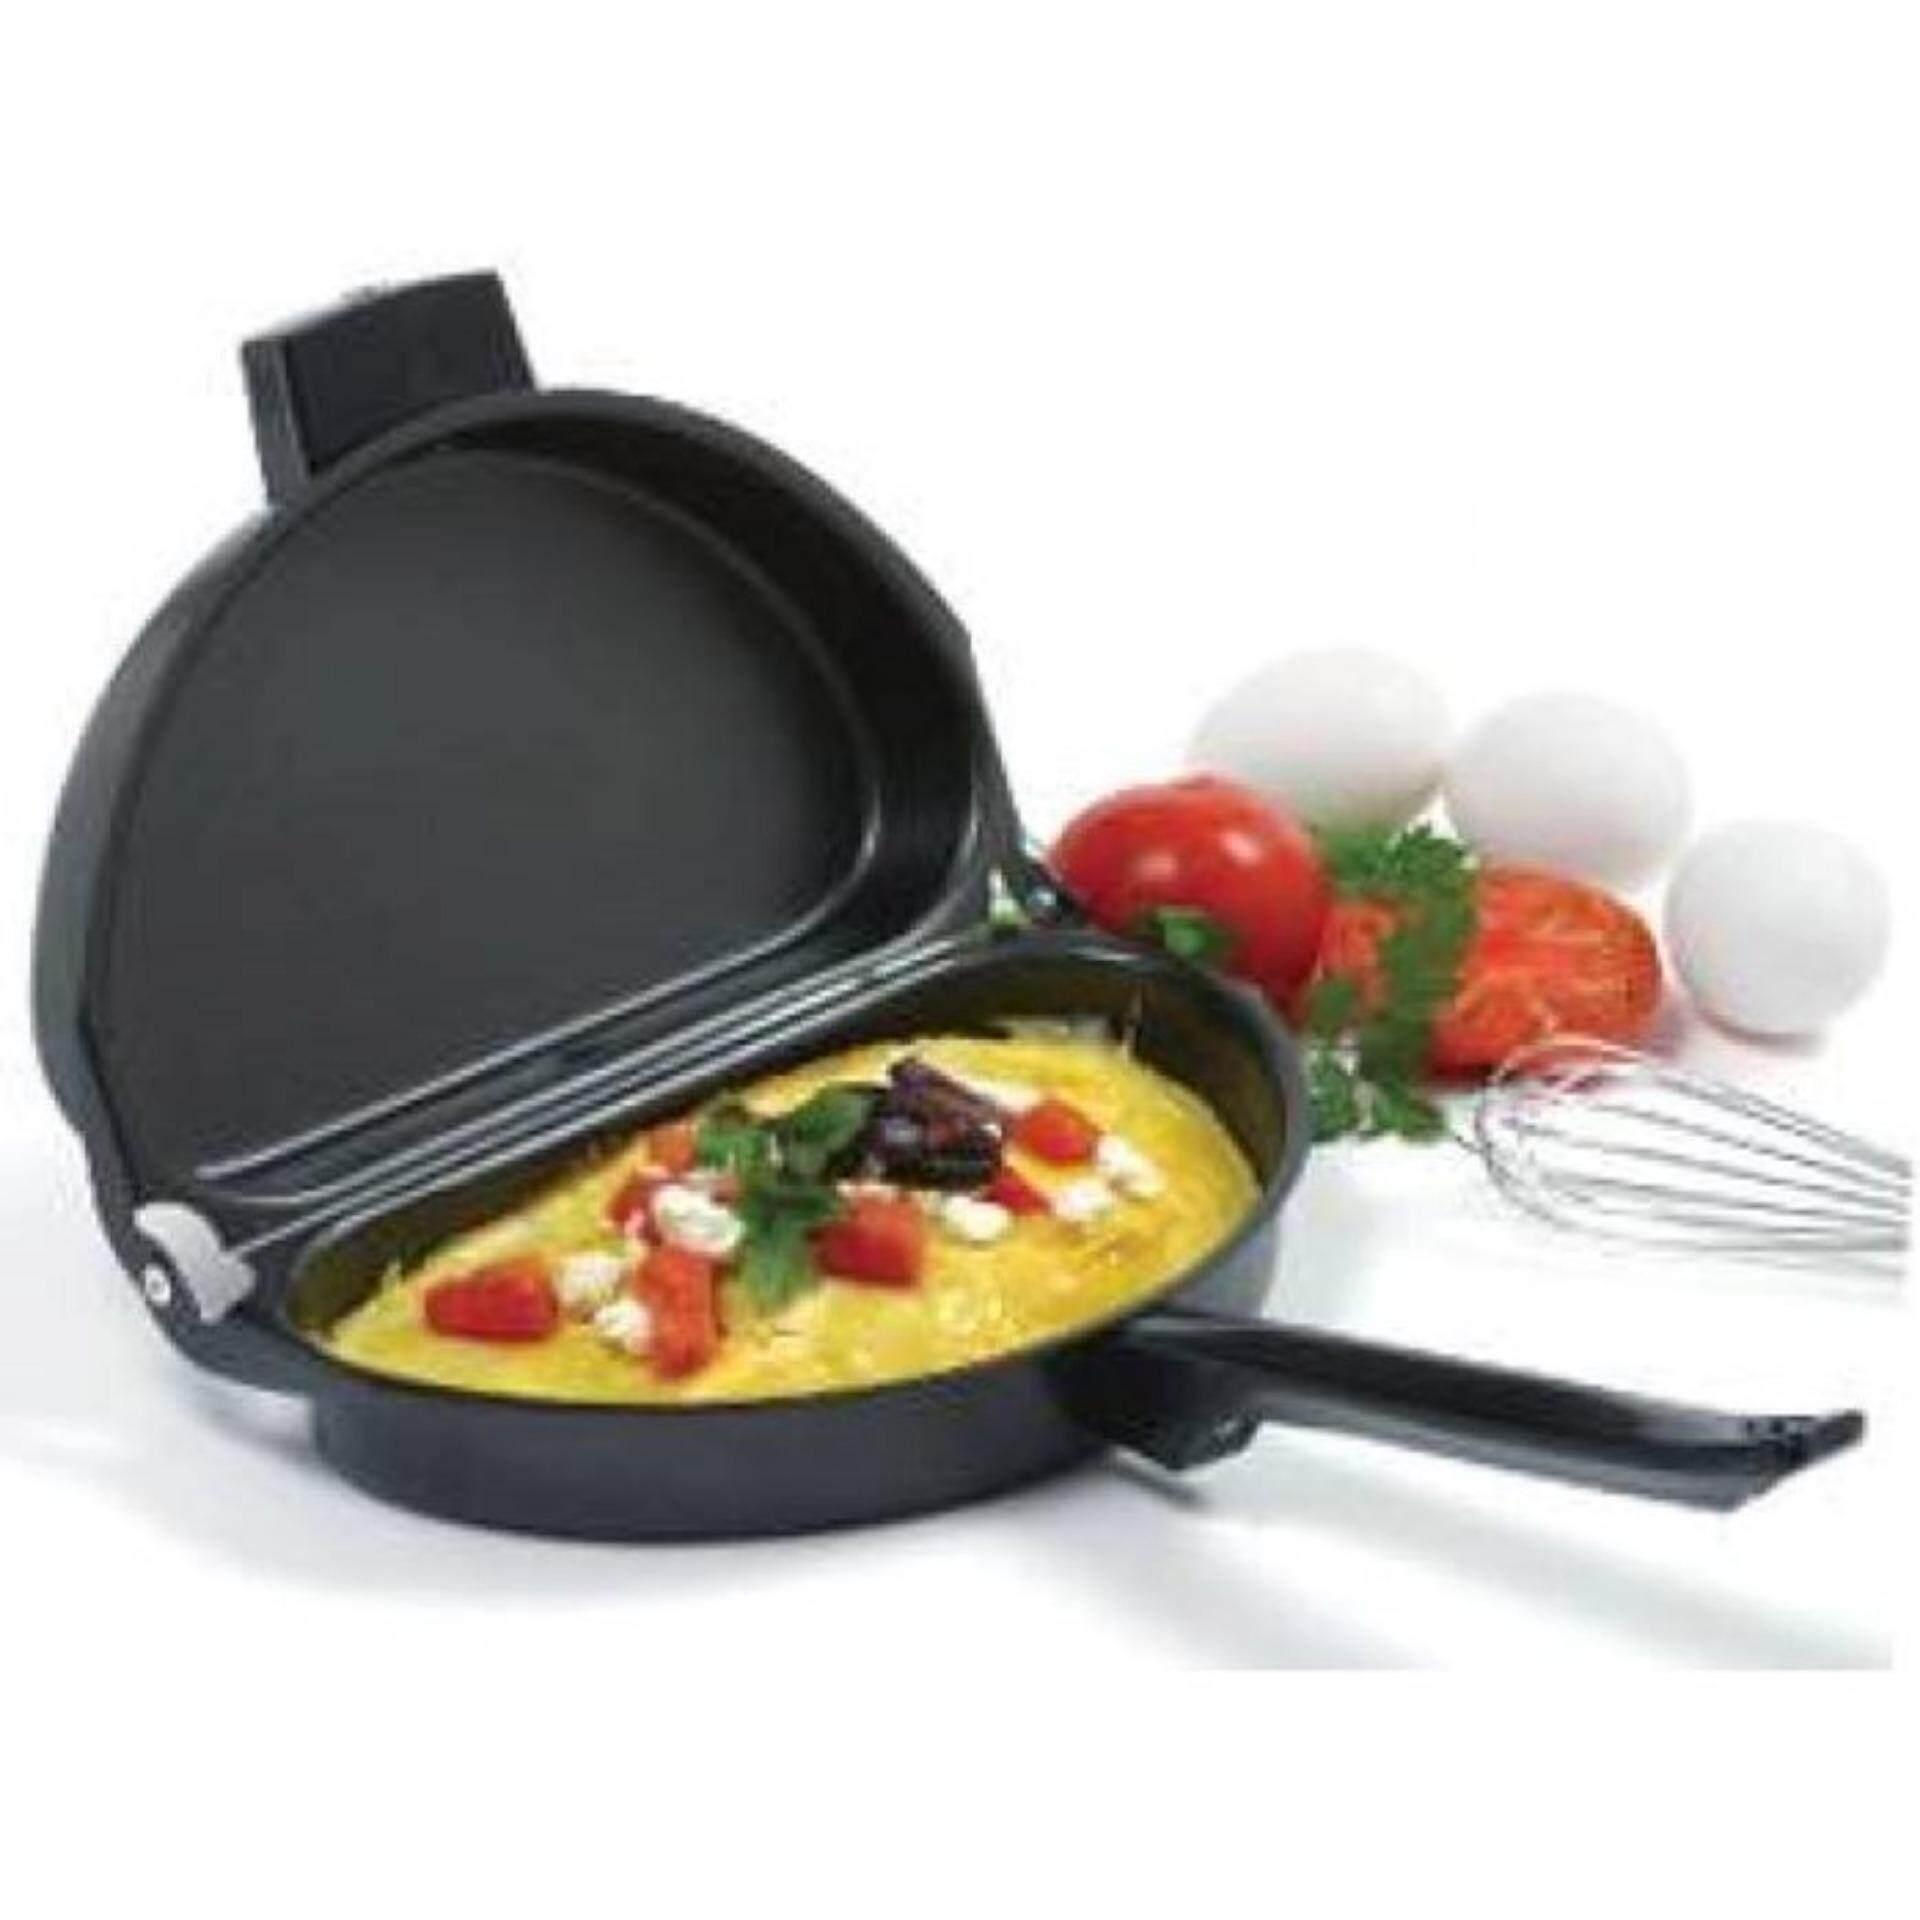 Non-Stick Double Sided Folding Omelette Egg Making Pan